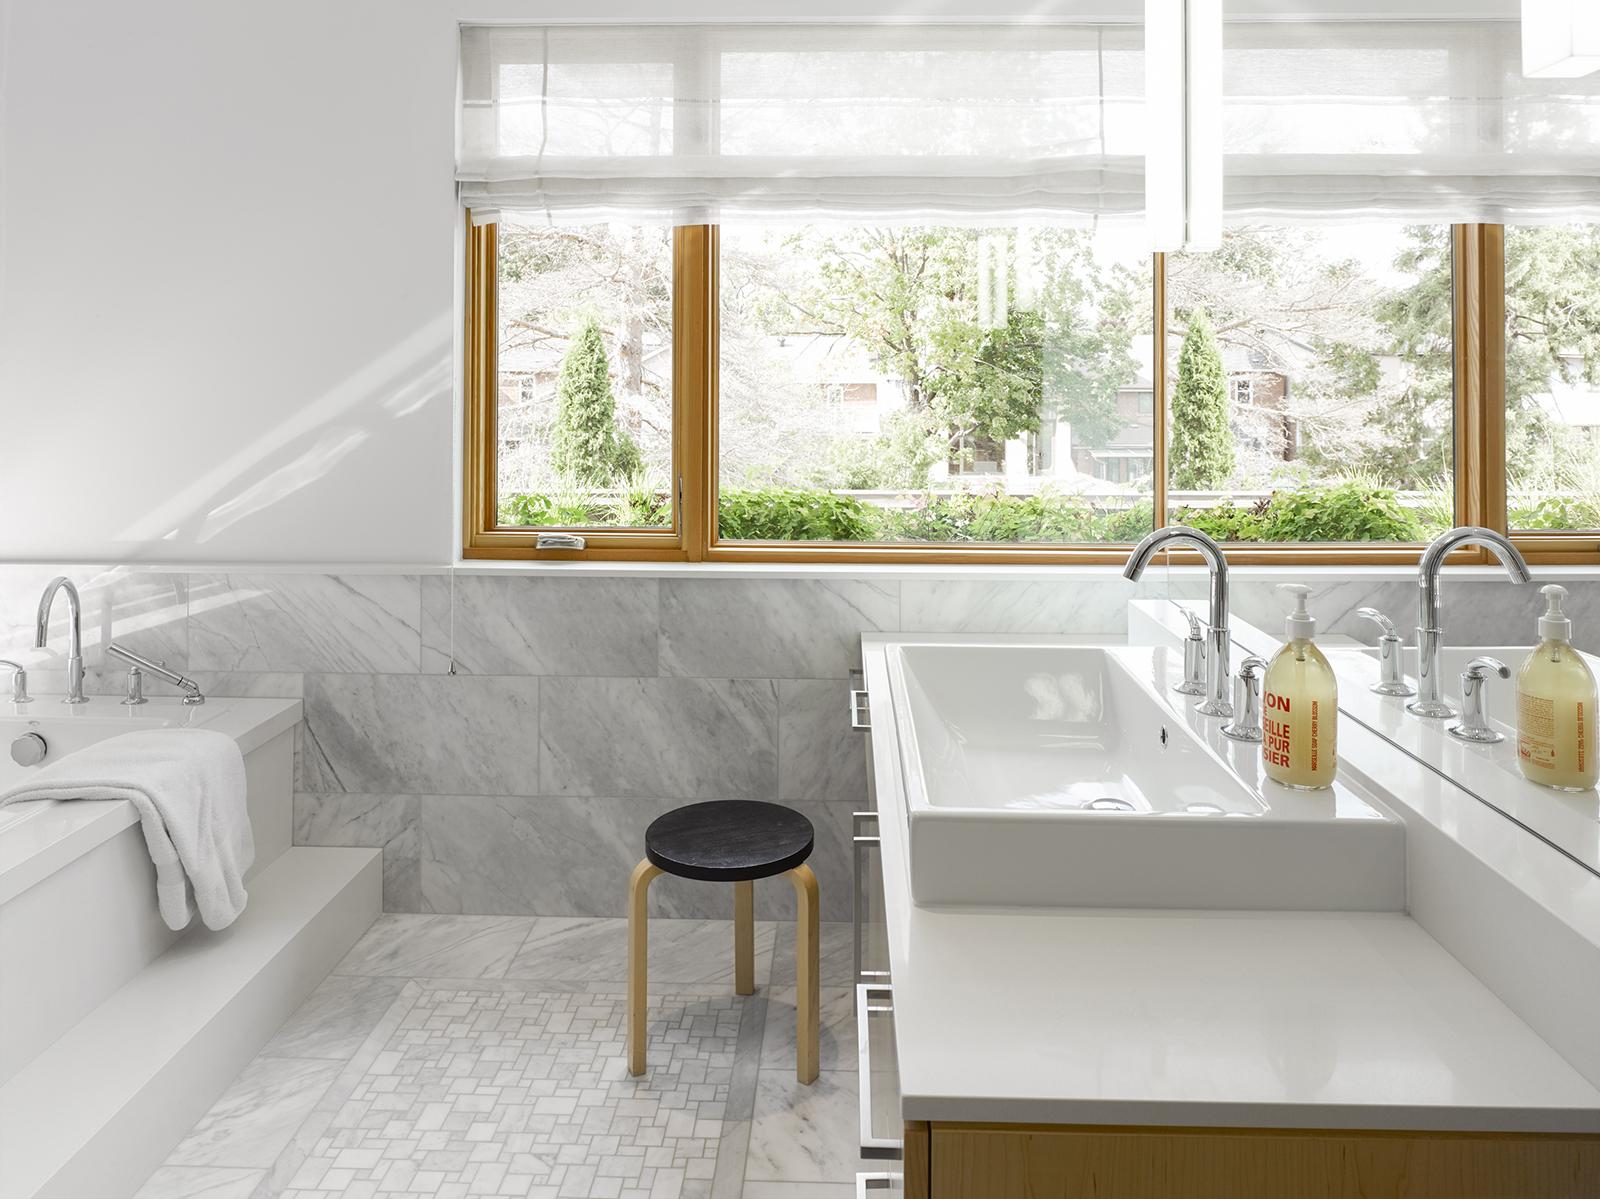 Carrara marble–clad bathroom in a modern house